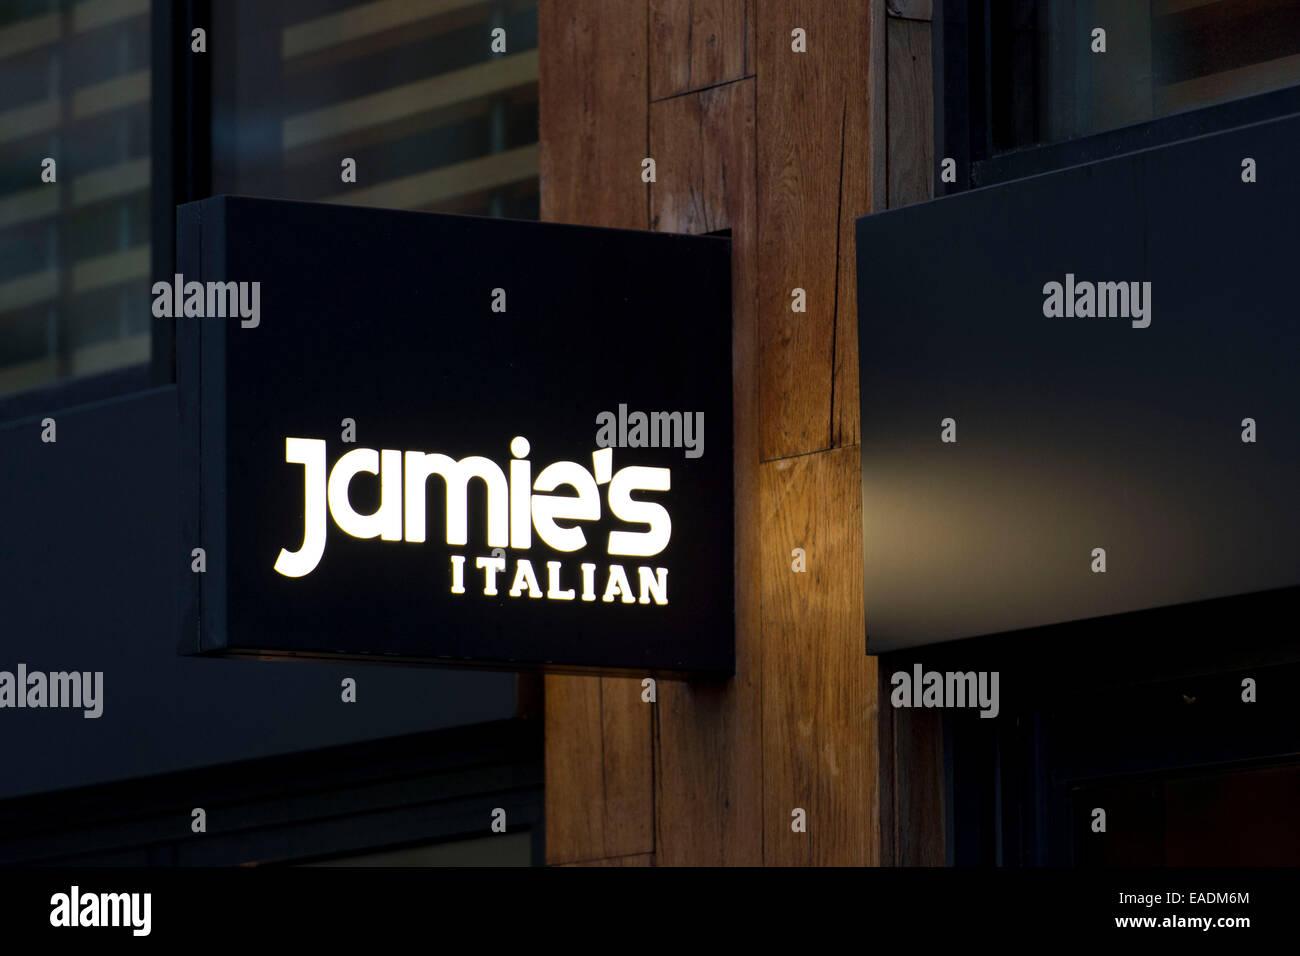 Jamie Oliver's Italian restaurant sign logo. - Stock Image